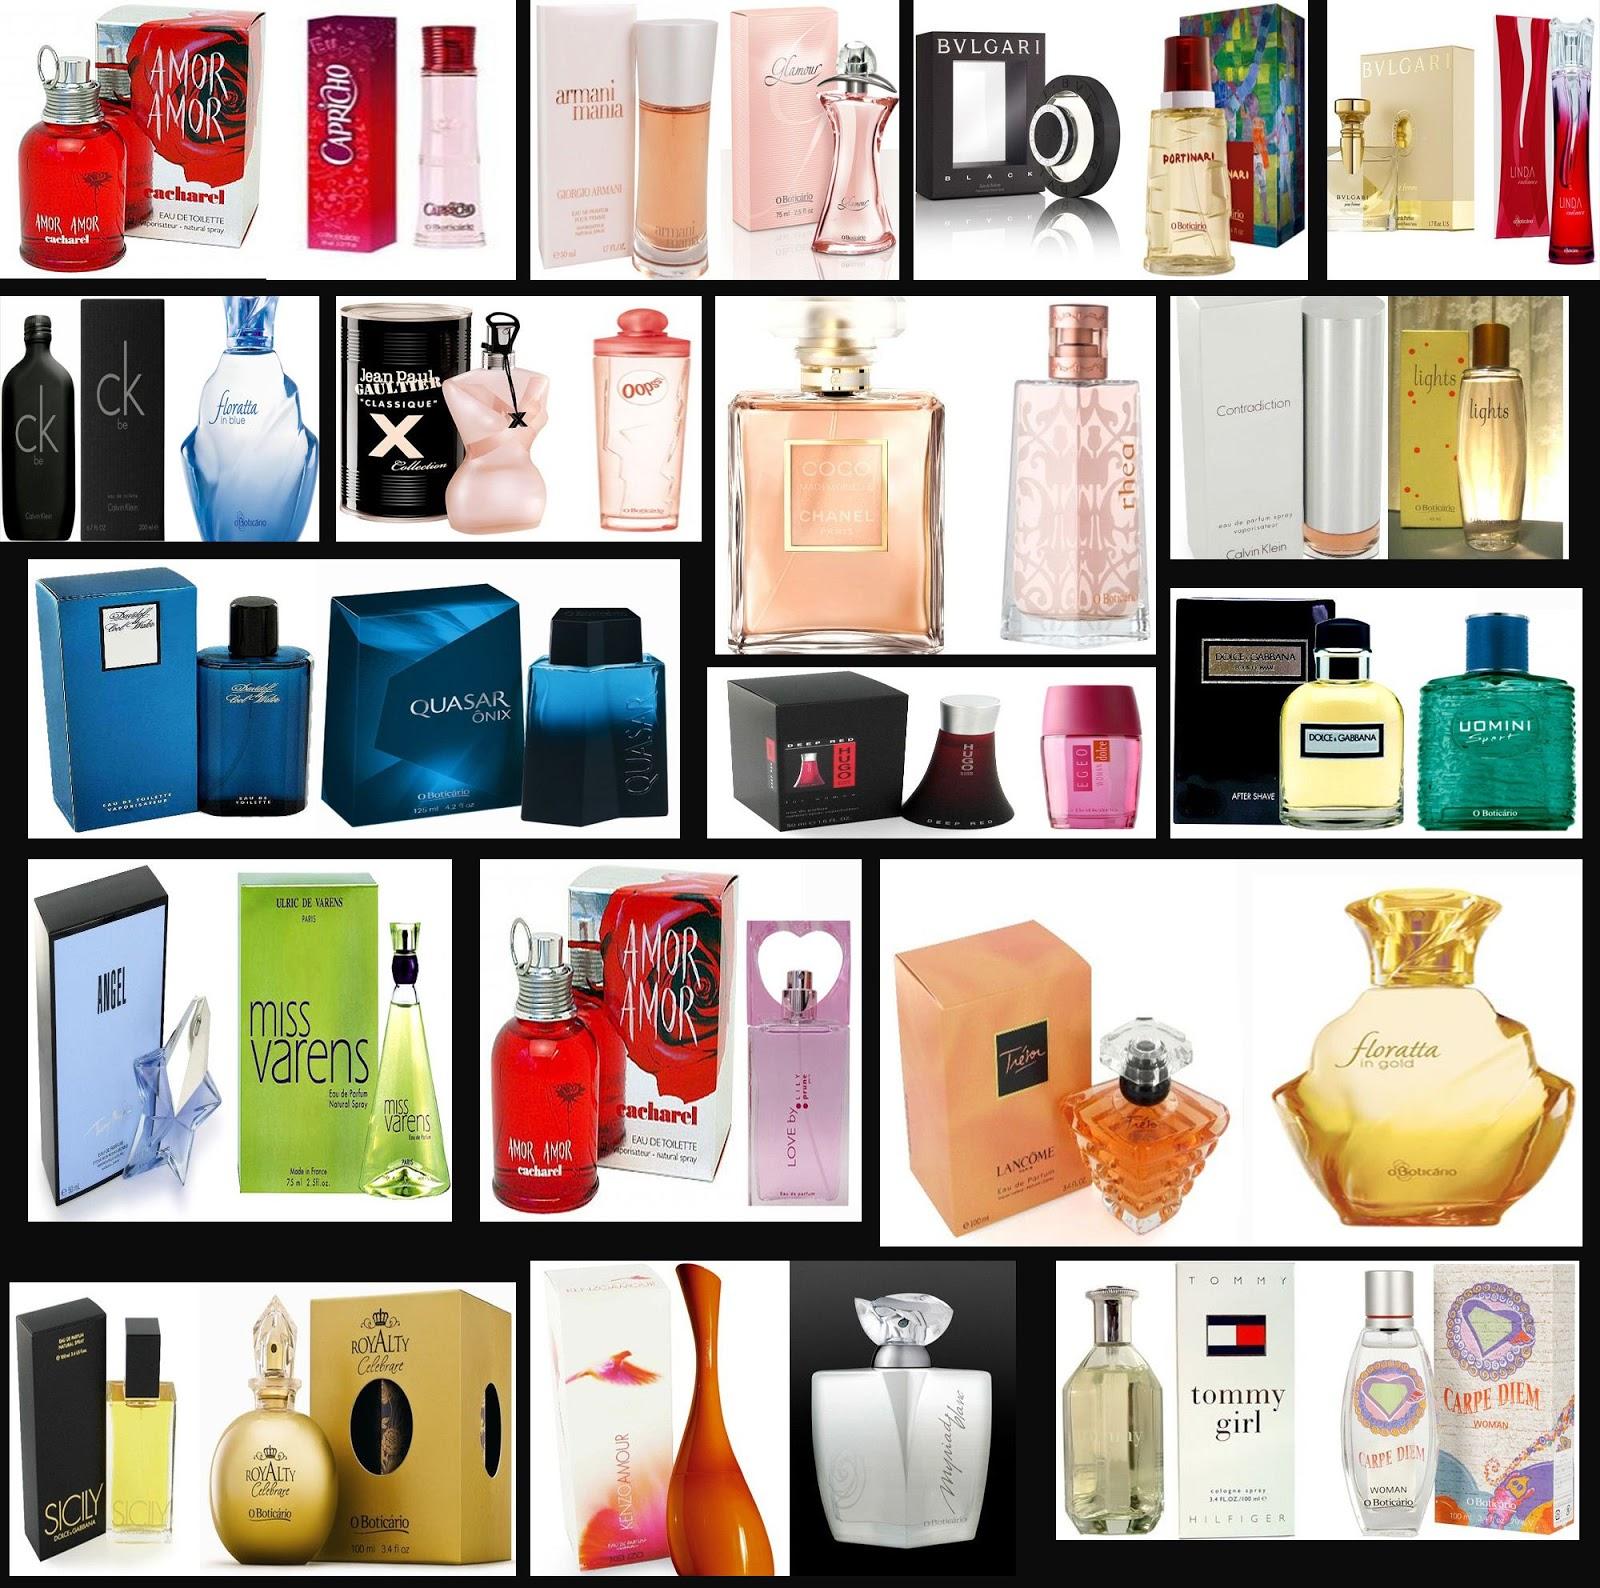 376528e9ef3 Perfumistico  Perfumes Similares Aos Importados